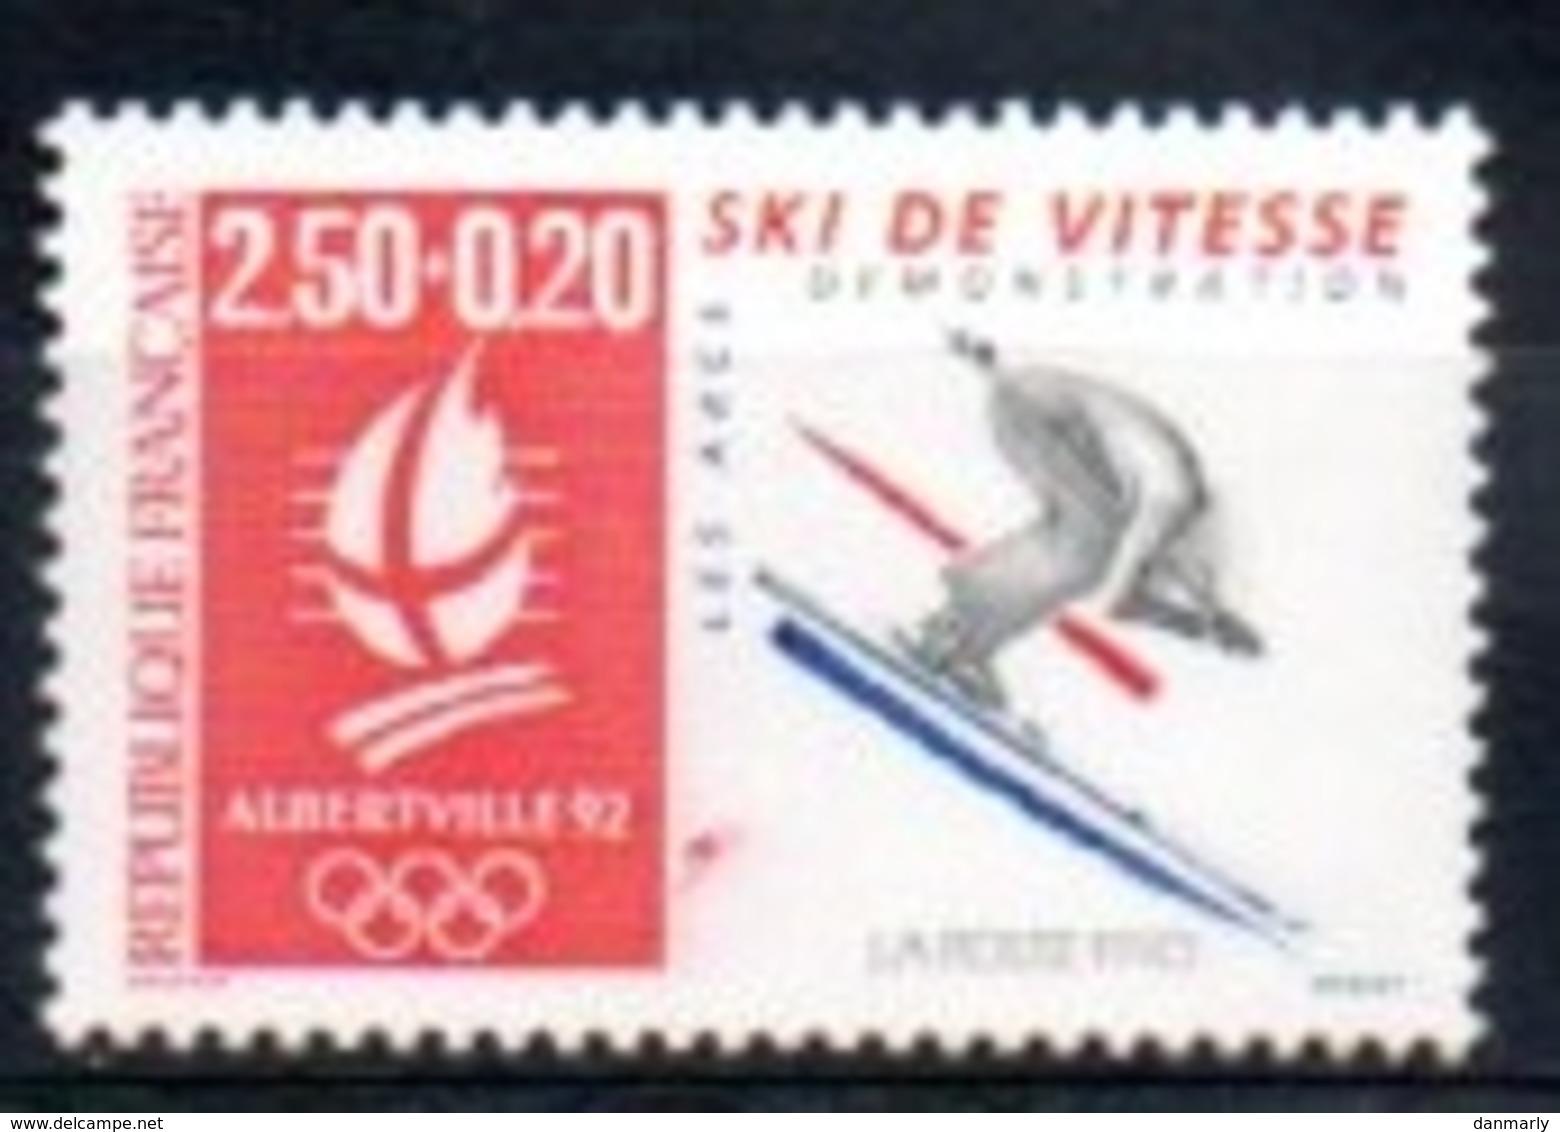 "France 1992 : Timbre N° 2739 Du Feuillet Y&T N° 14  "" Ski De Vitesse "" - Frankreich"